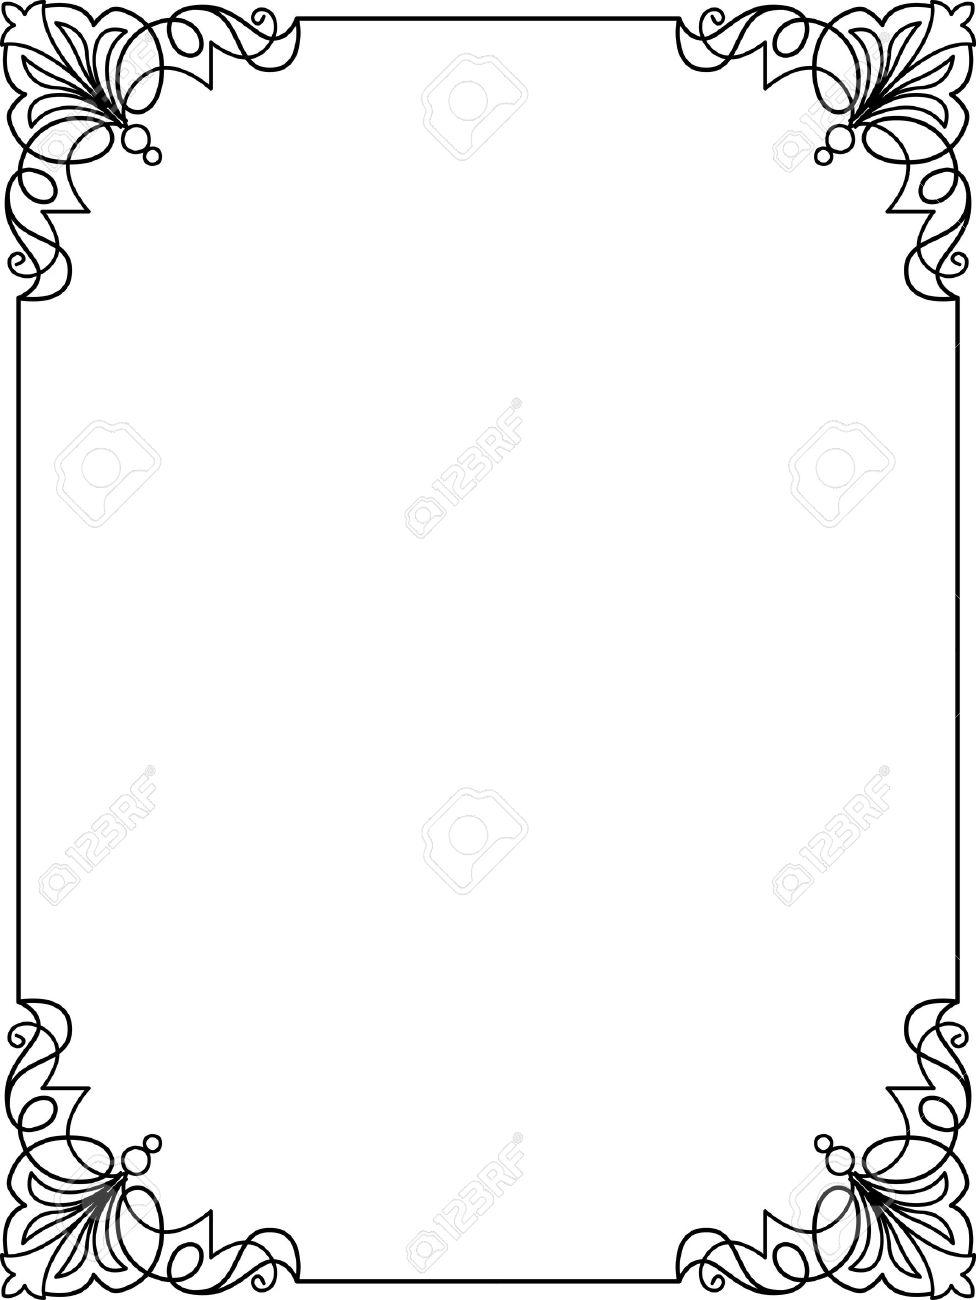 simple lines border frame